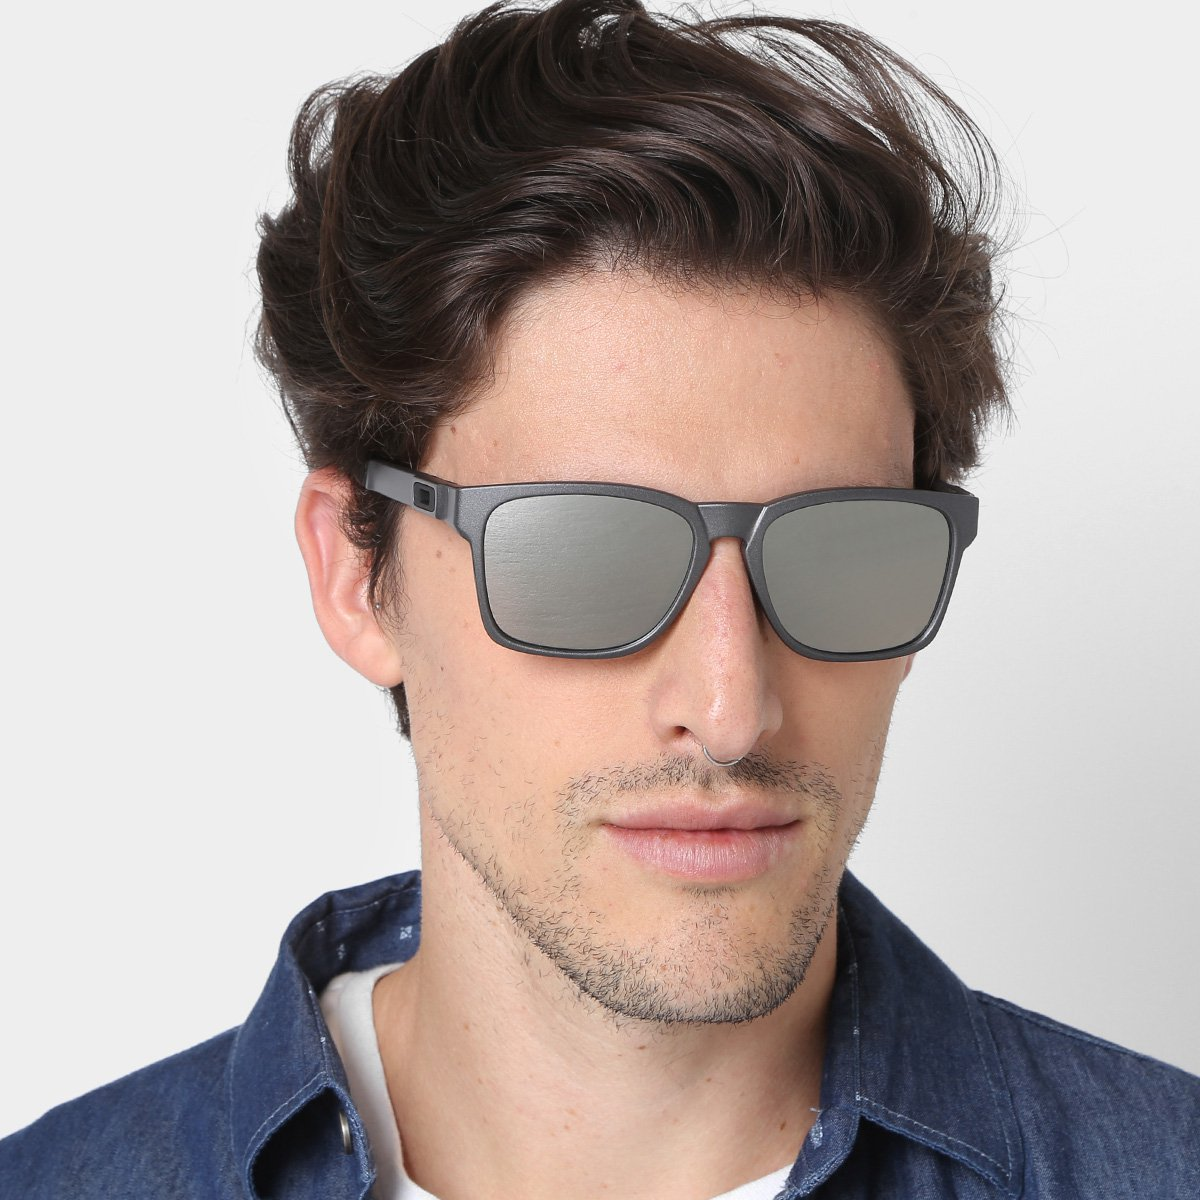 c9e8e24c7b490 Óculos de Sol Oakley Catalyst Iridium Masculino - Compre Agora ...